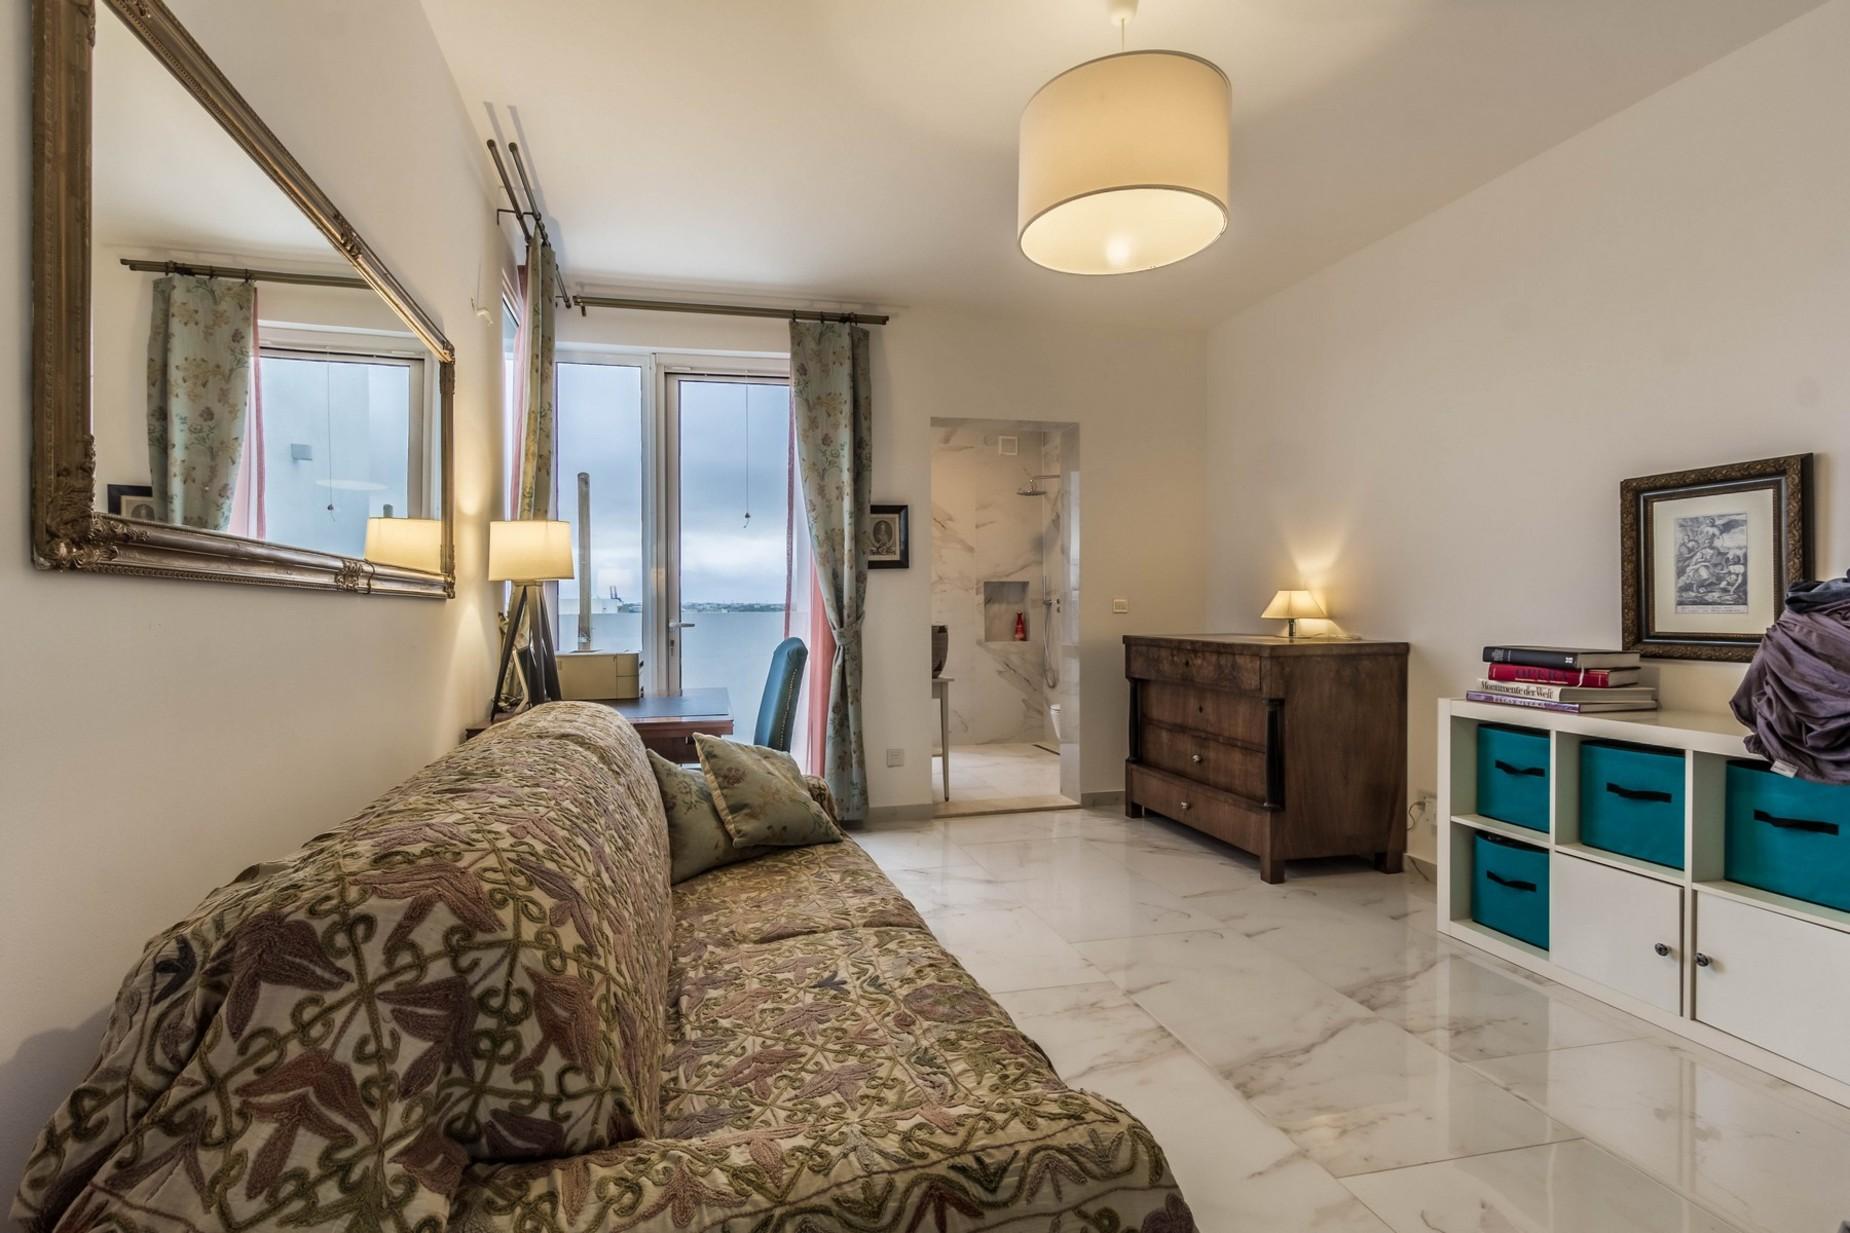 2 bed Penthouse For Sale in Pieta, Pieta - thumb 11